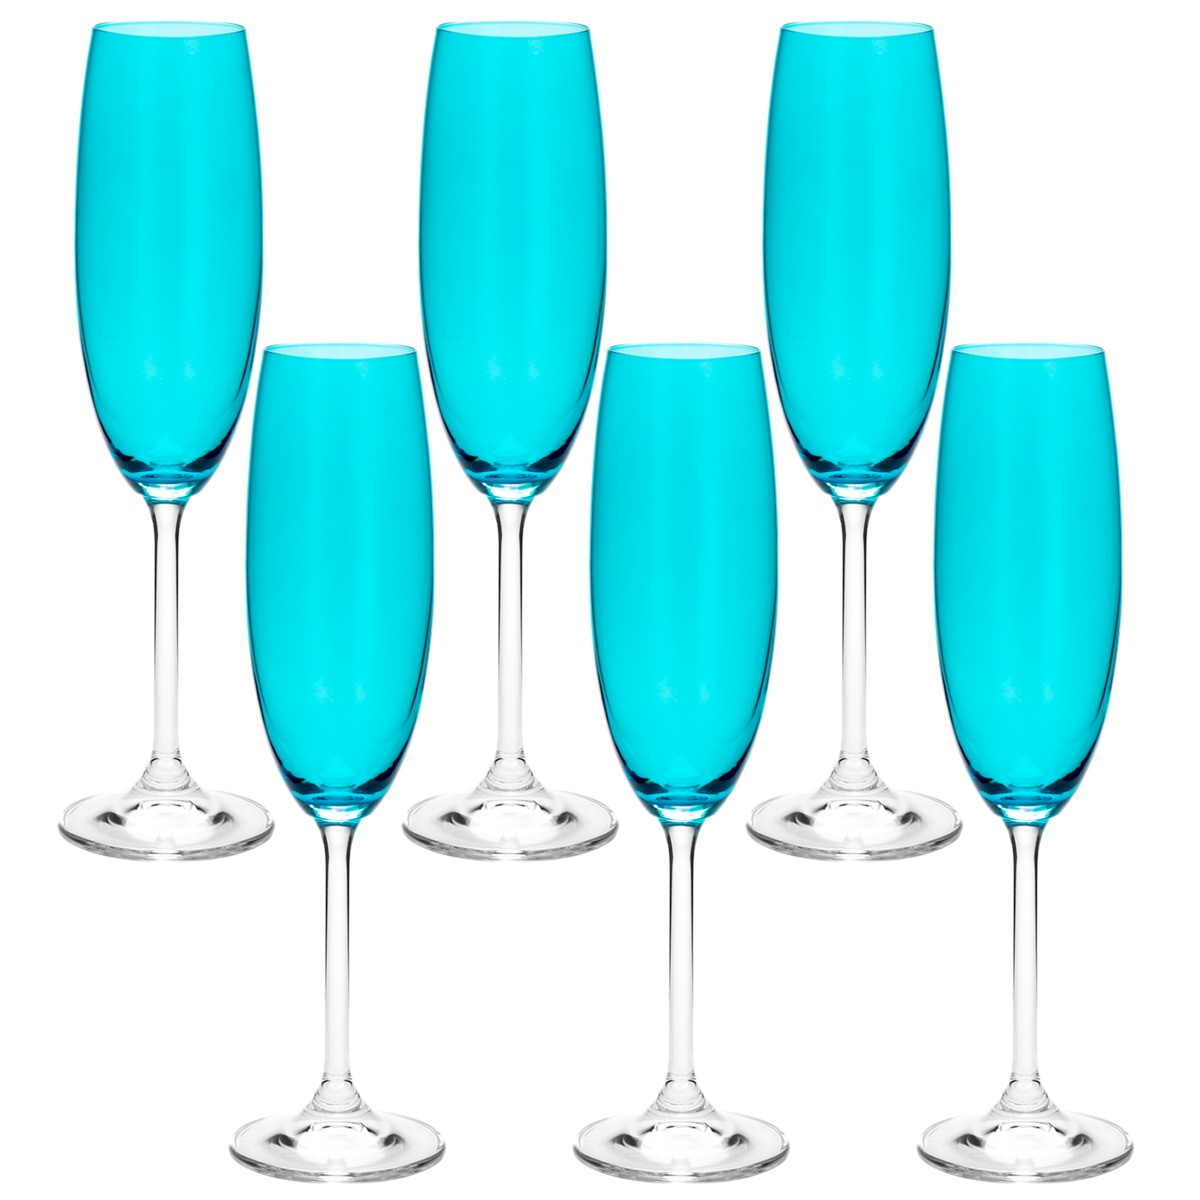 Jg 6 taças champanhe cristal colibri turquesa 220ml Bohemia